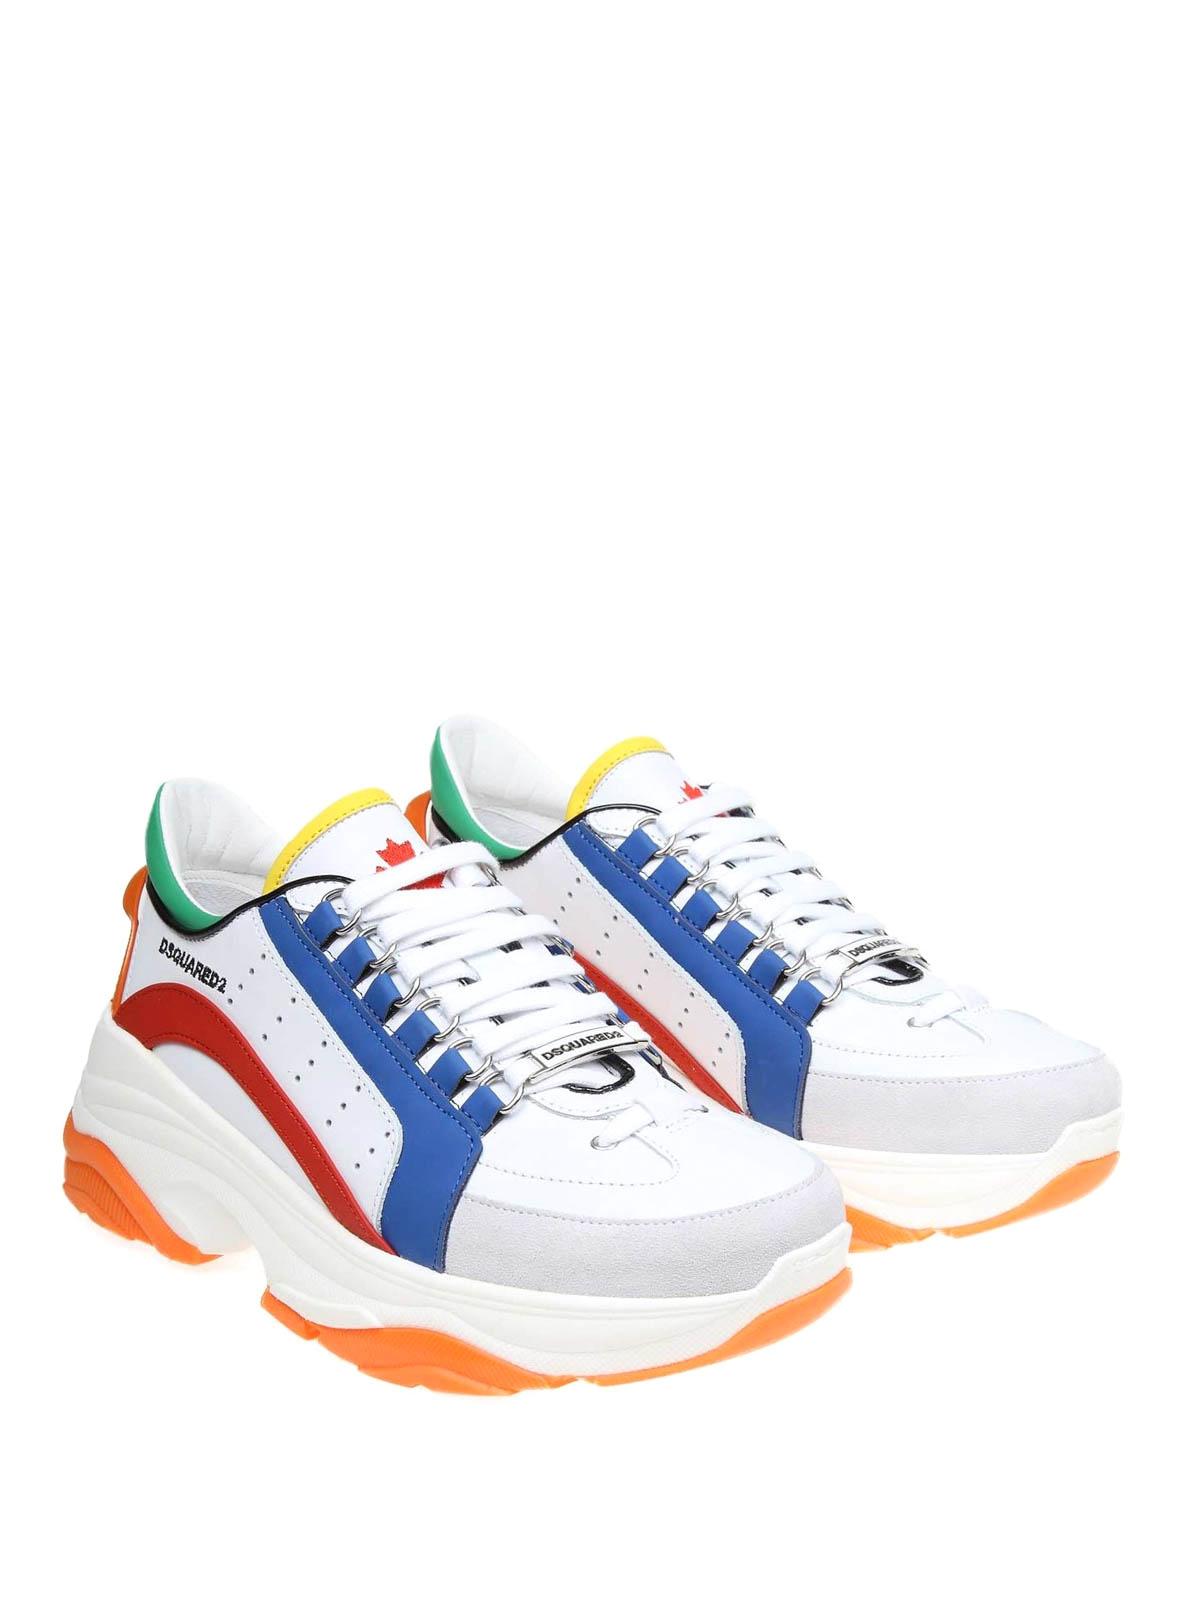 c69718a47 Dsquared2 - Baskets - Bumpy 551 - Chaussures de sport - SNW00411157M1574